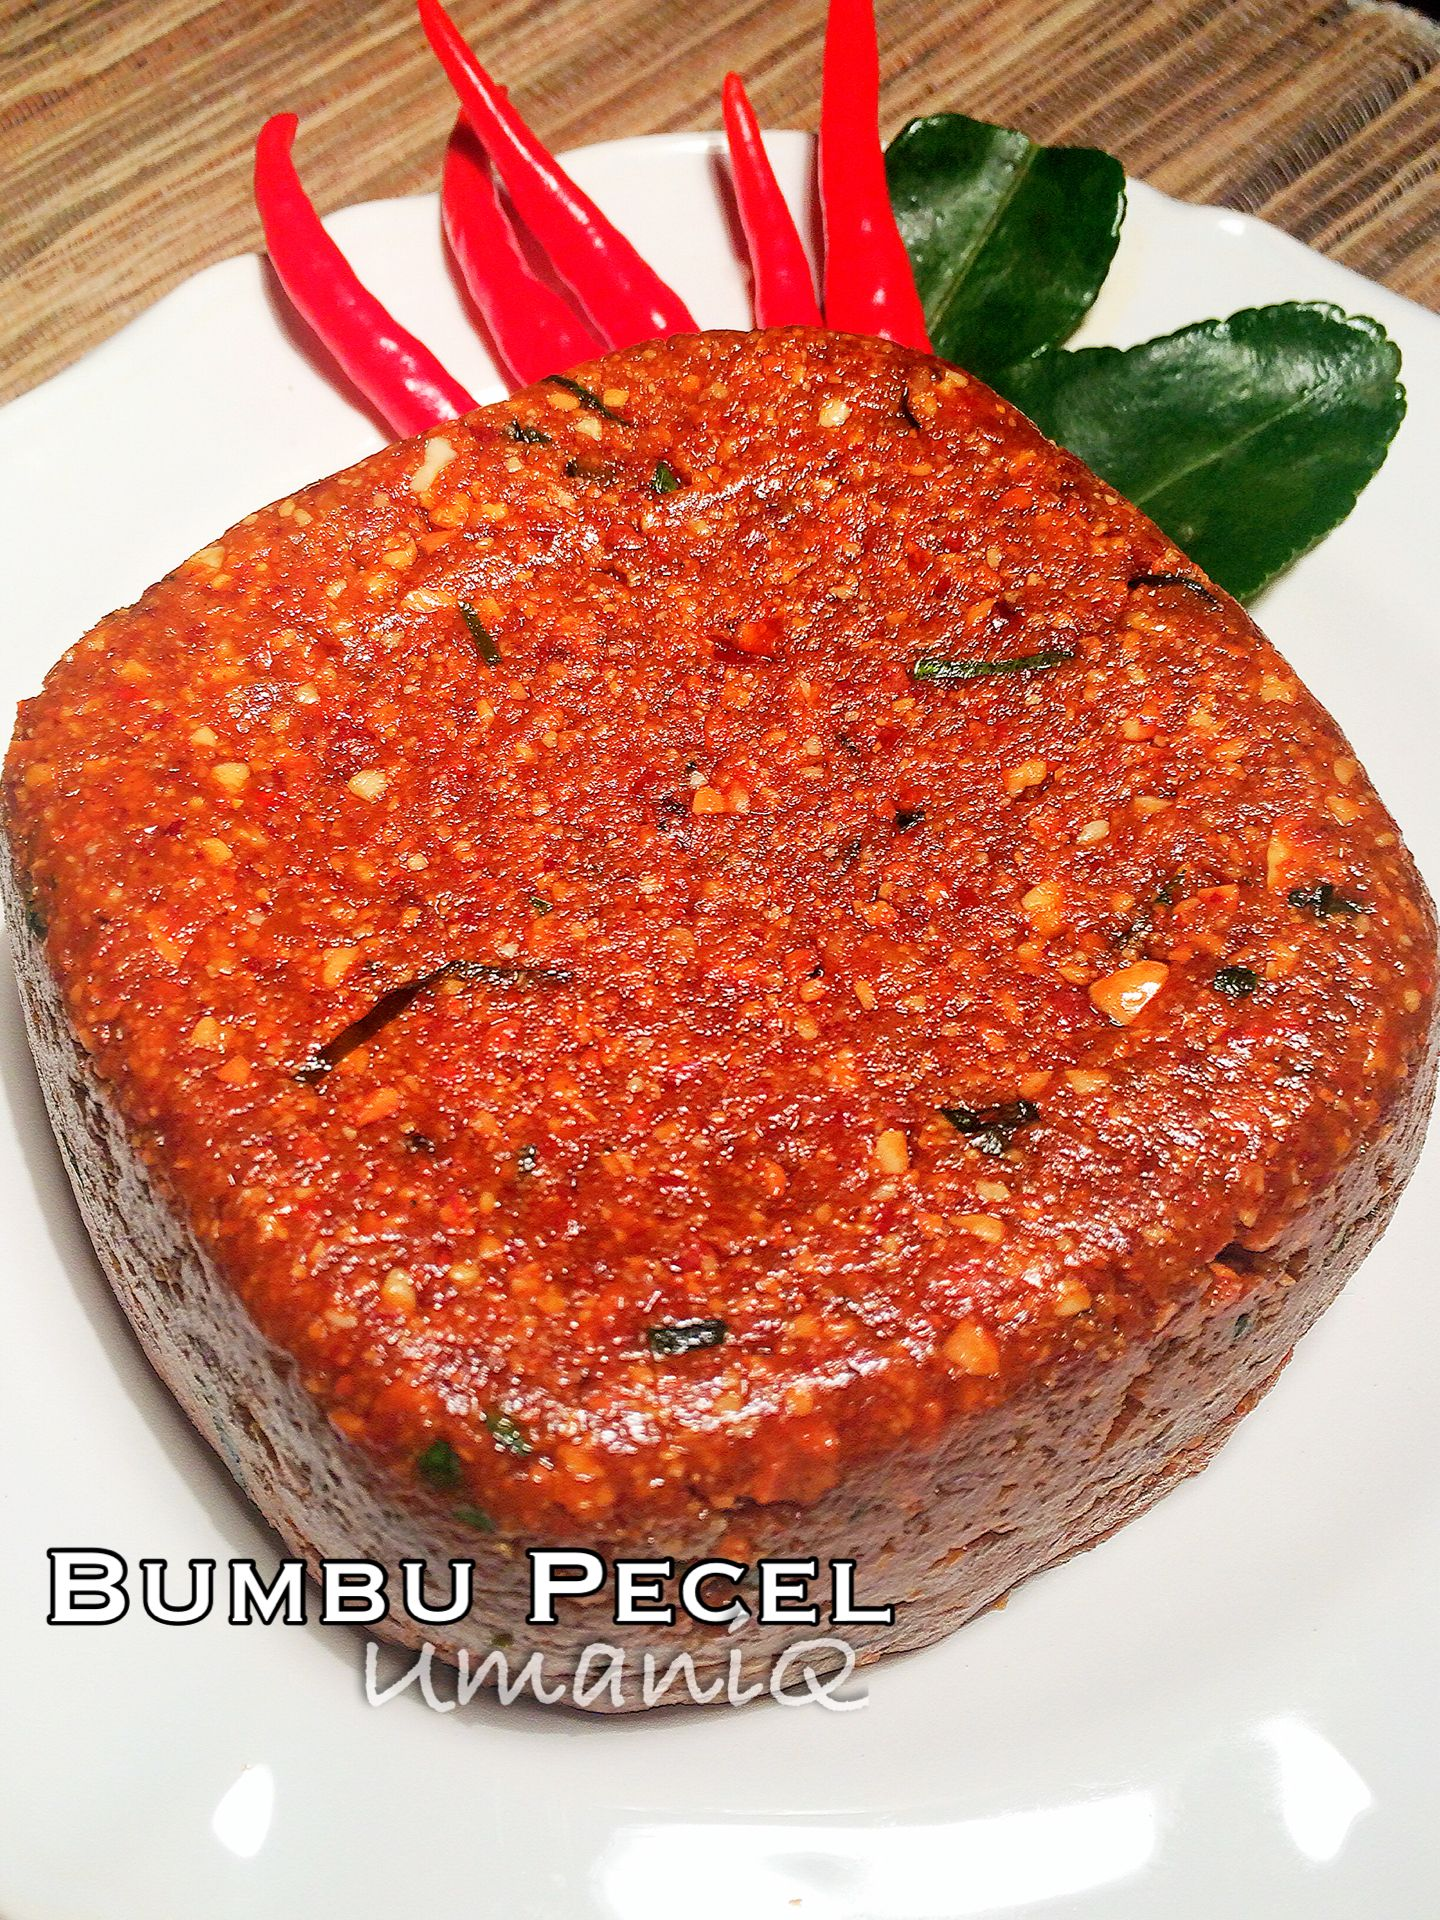 Bumbu Pecel Food, Pecel, Indonesian food